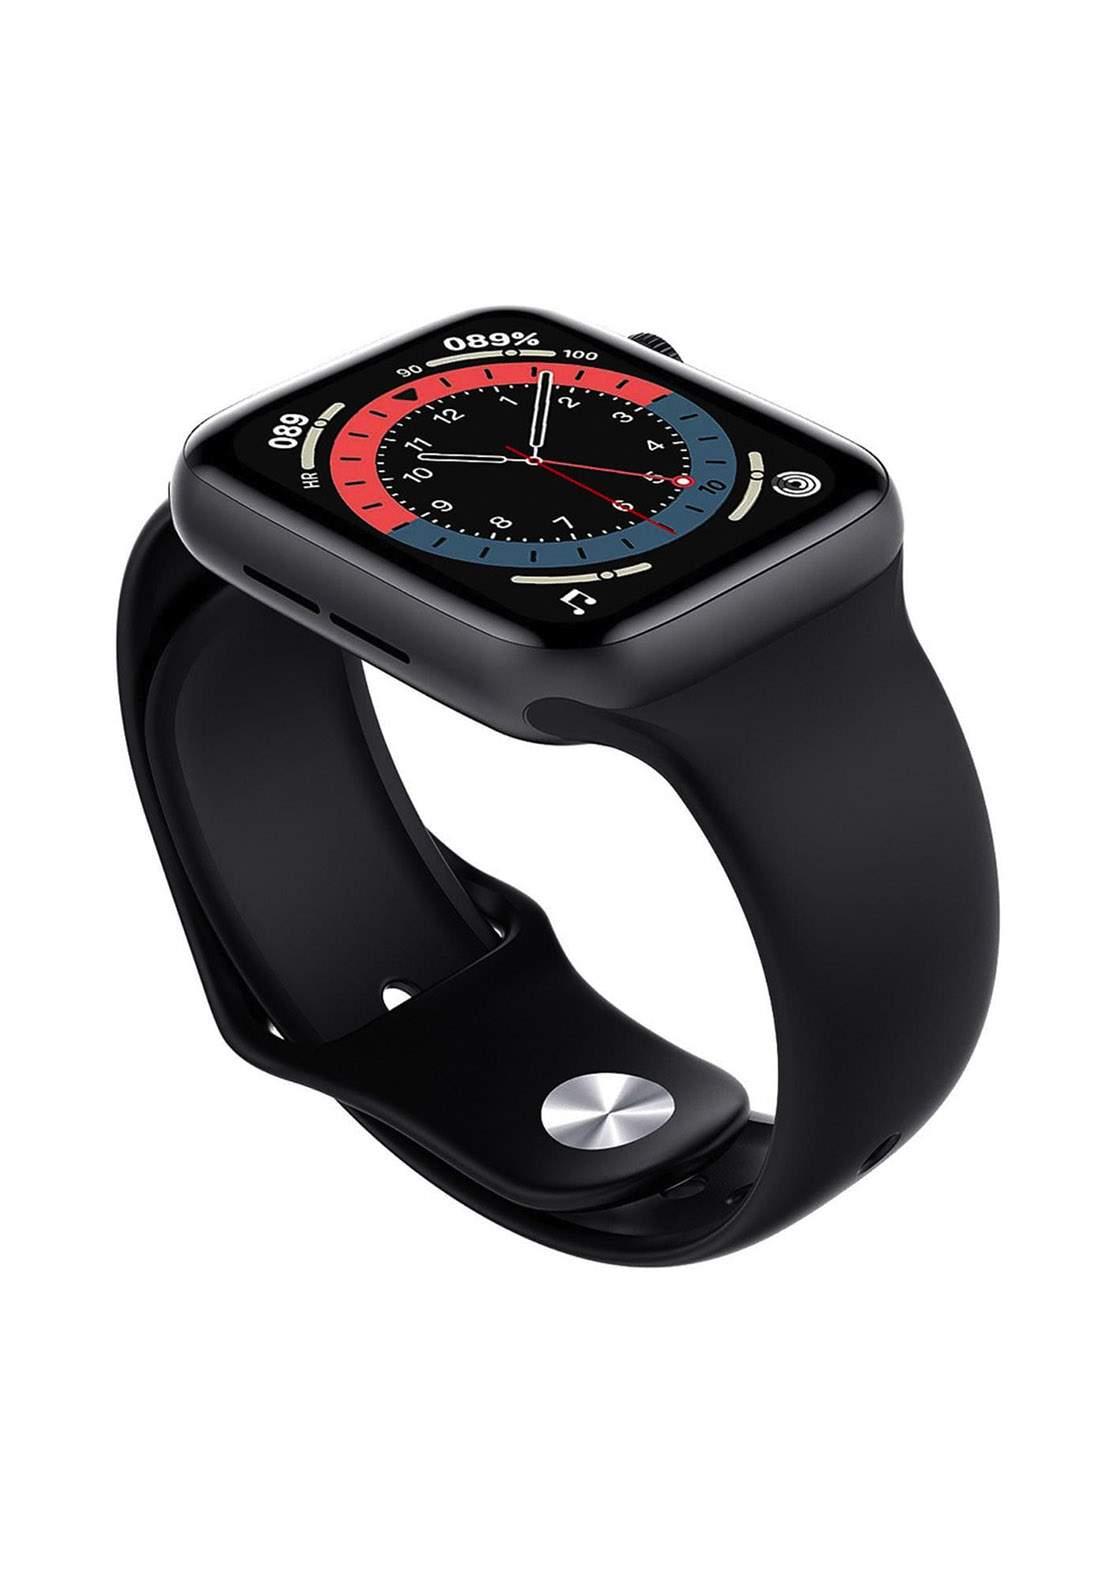 HW22 Smart watch Hand 6th edition  - Black  ساعة ذكية